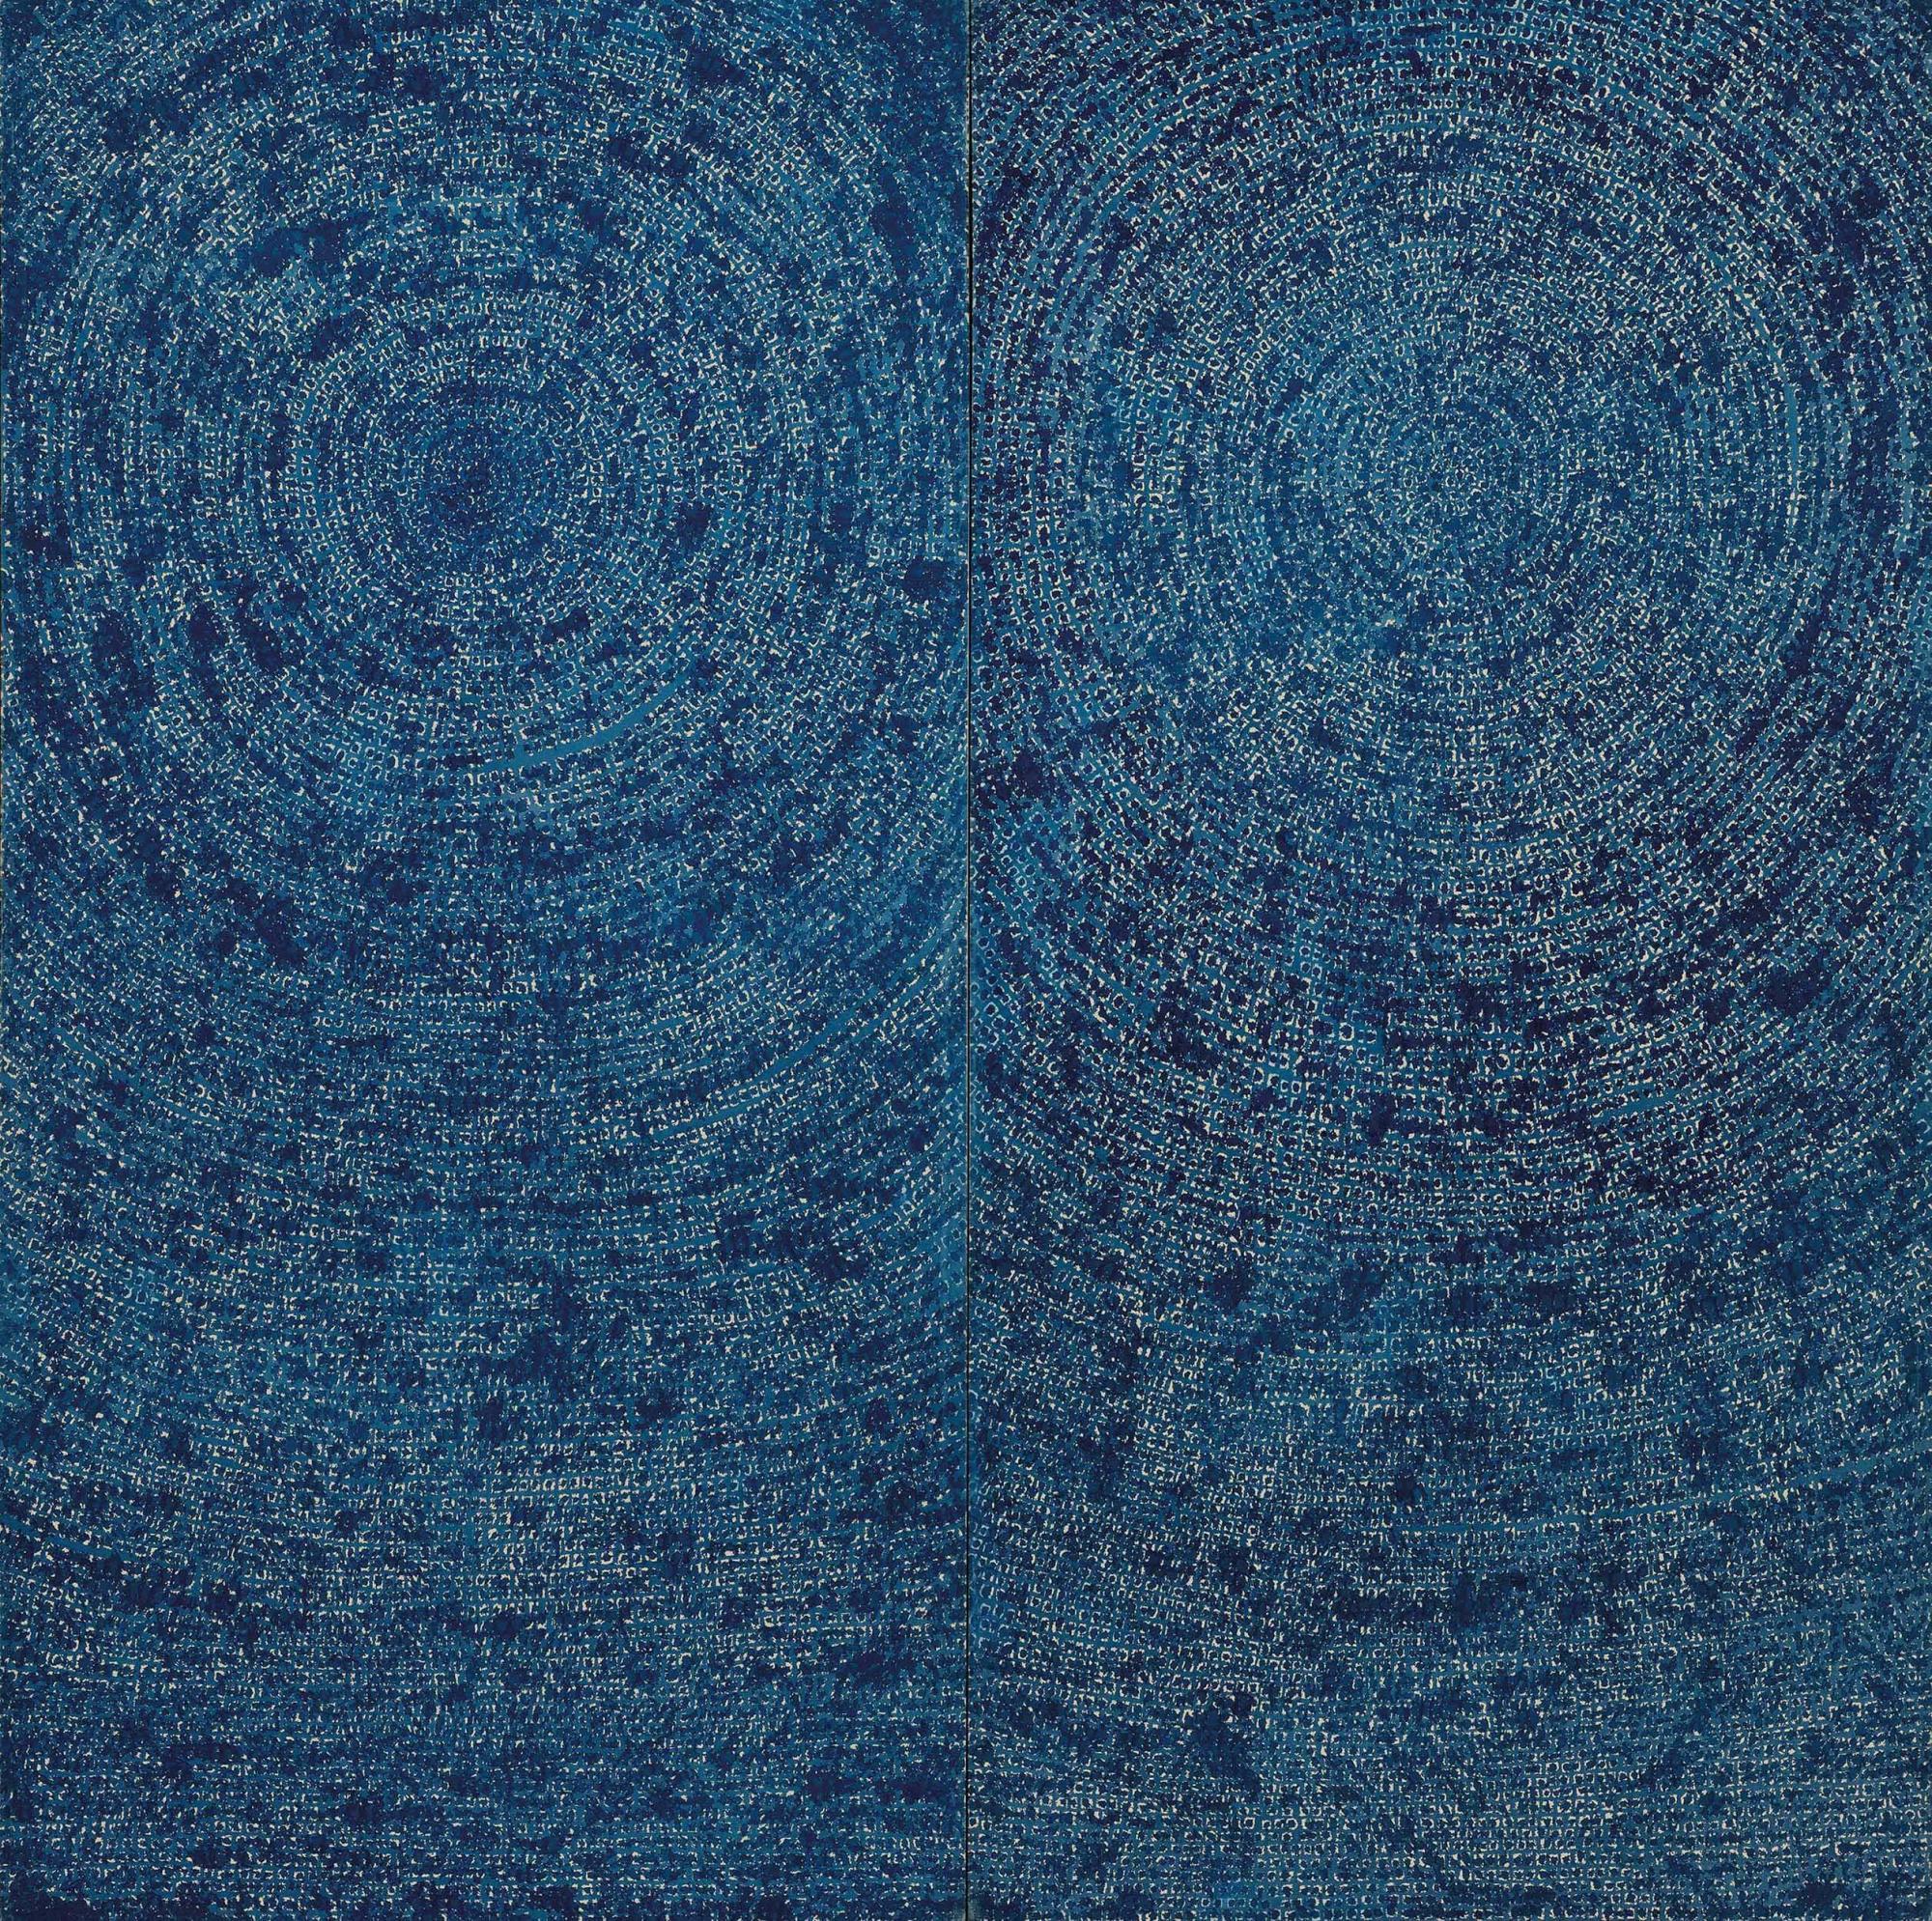 MATTHEW KIM與CHAE KUM KIM珍藏 金煥基 (1913-1974) 《05-IV-71 #200(宇宙)》 油彩 棉布 二聯作 每幅:254 x 127公分(100 x 50吋) 全幅:254 x 254公分(100 x 100吋) 1971年作 港幣48,000,000-62,000,000 /美元6,000,000-8,000,000